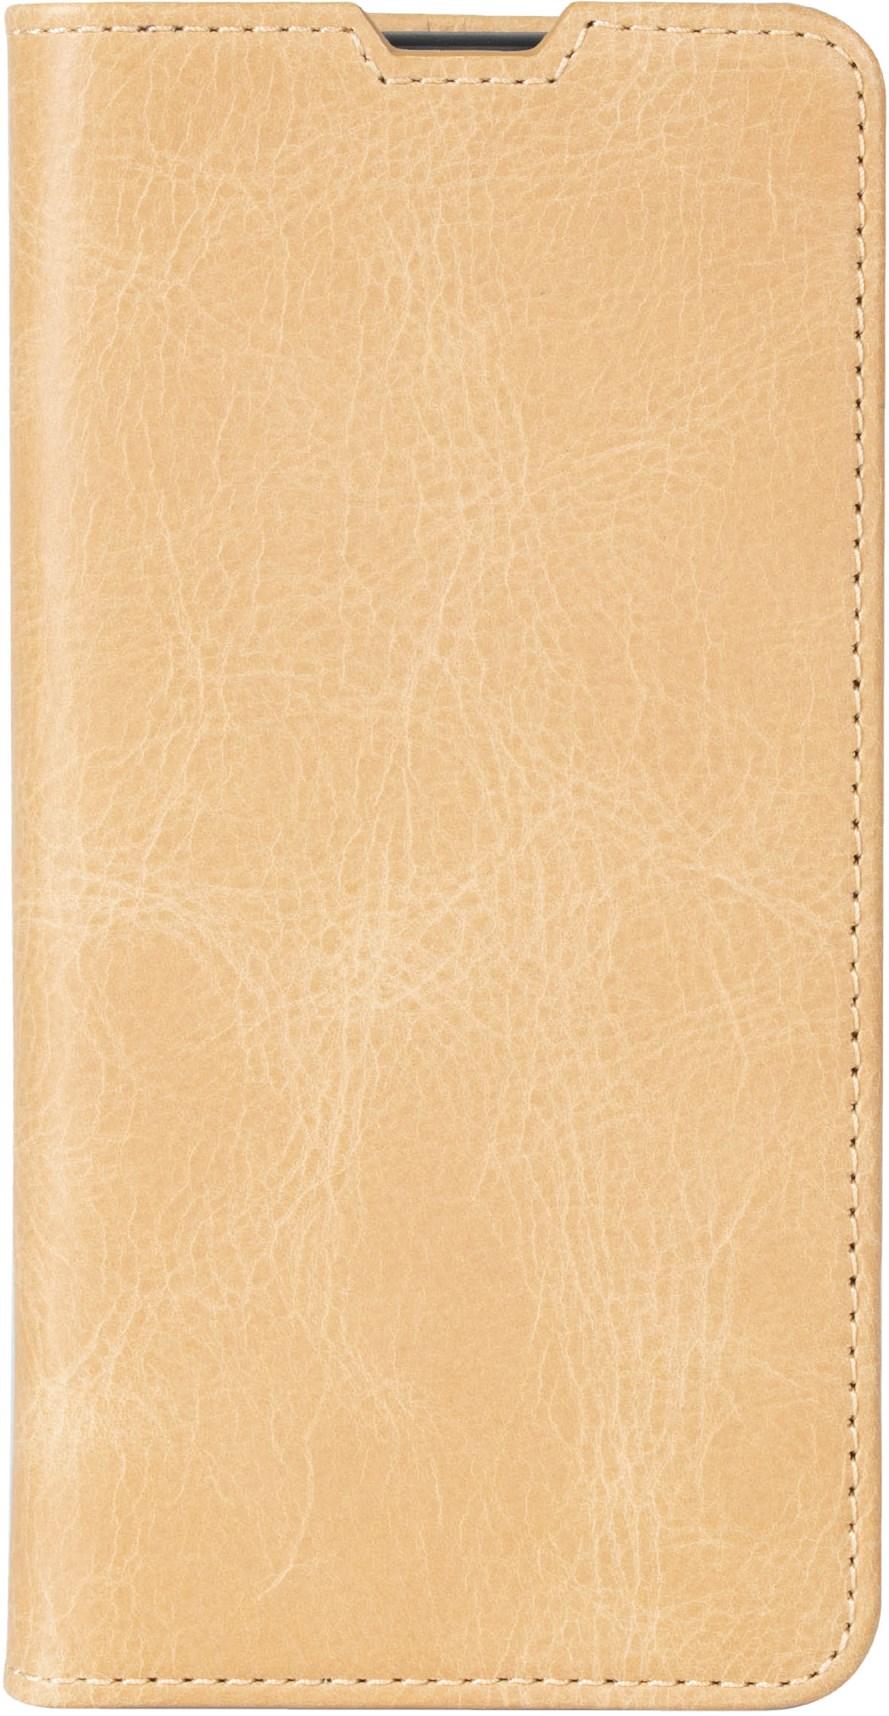 Krusell Sunne 2 Card Foliowallet Samsung Galaxy S10 Plus VintageNude